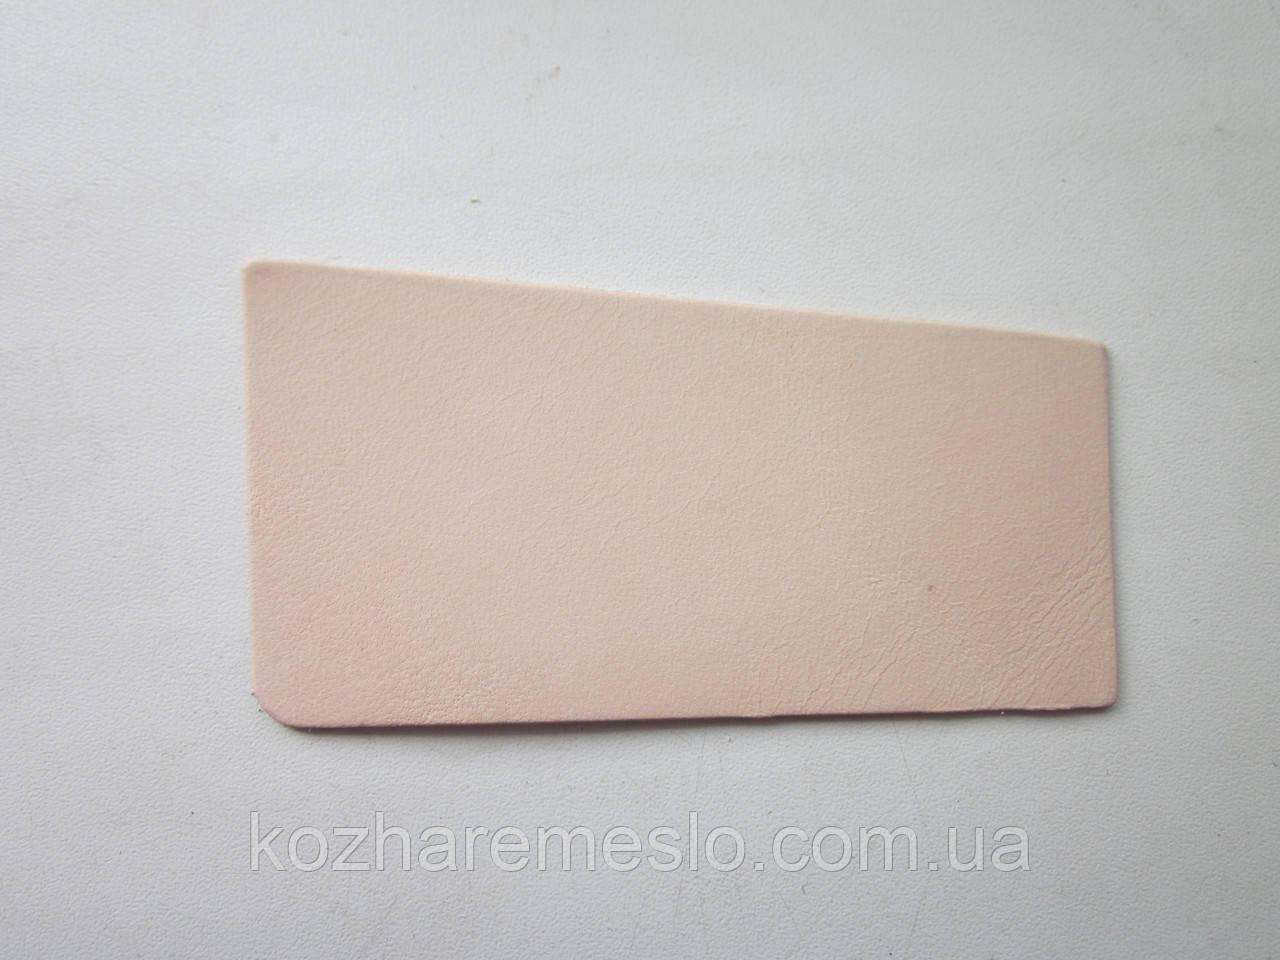 Карман(левый) под кредитную карту для кошелька (0.9 -1.1 мм)